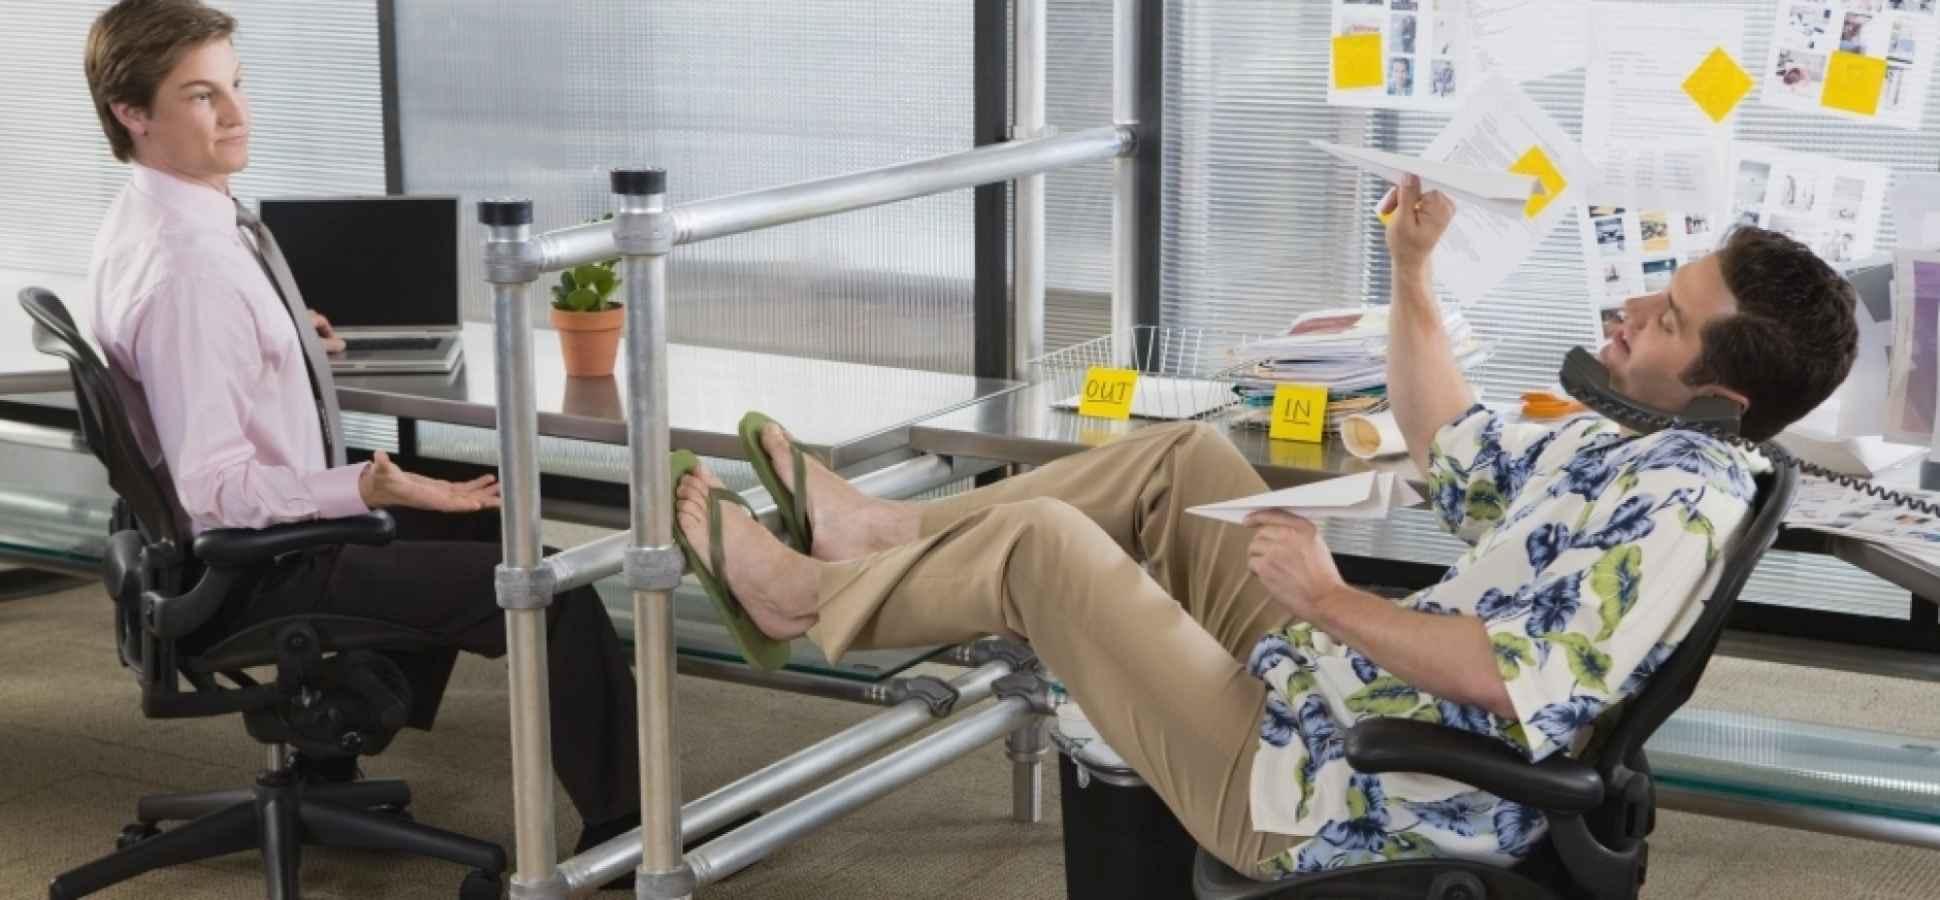 7 Reasons Companies Should Never Hire an Entrepreneur